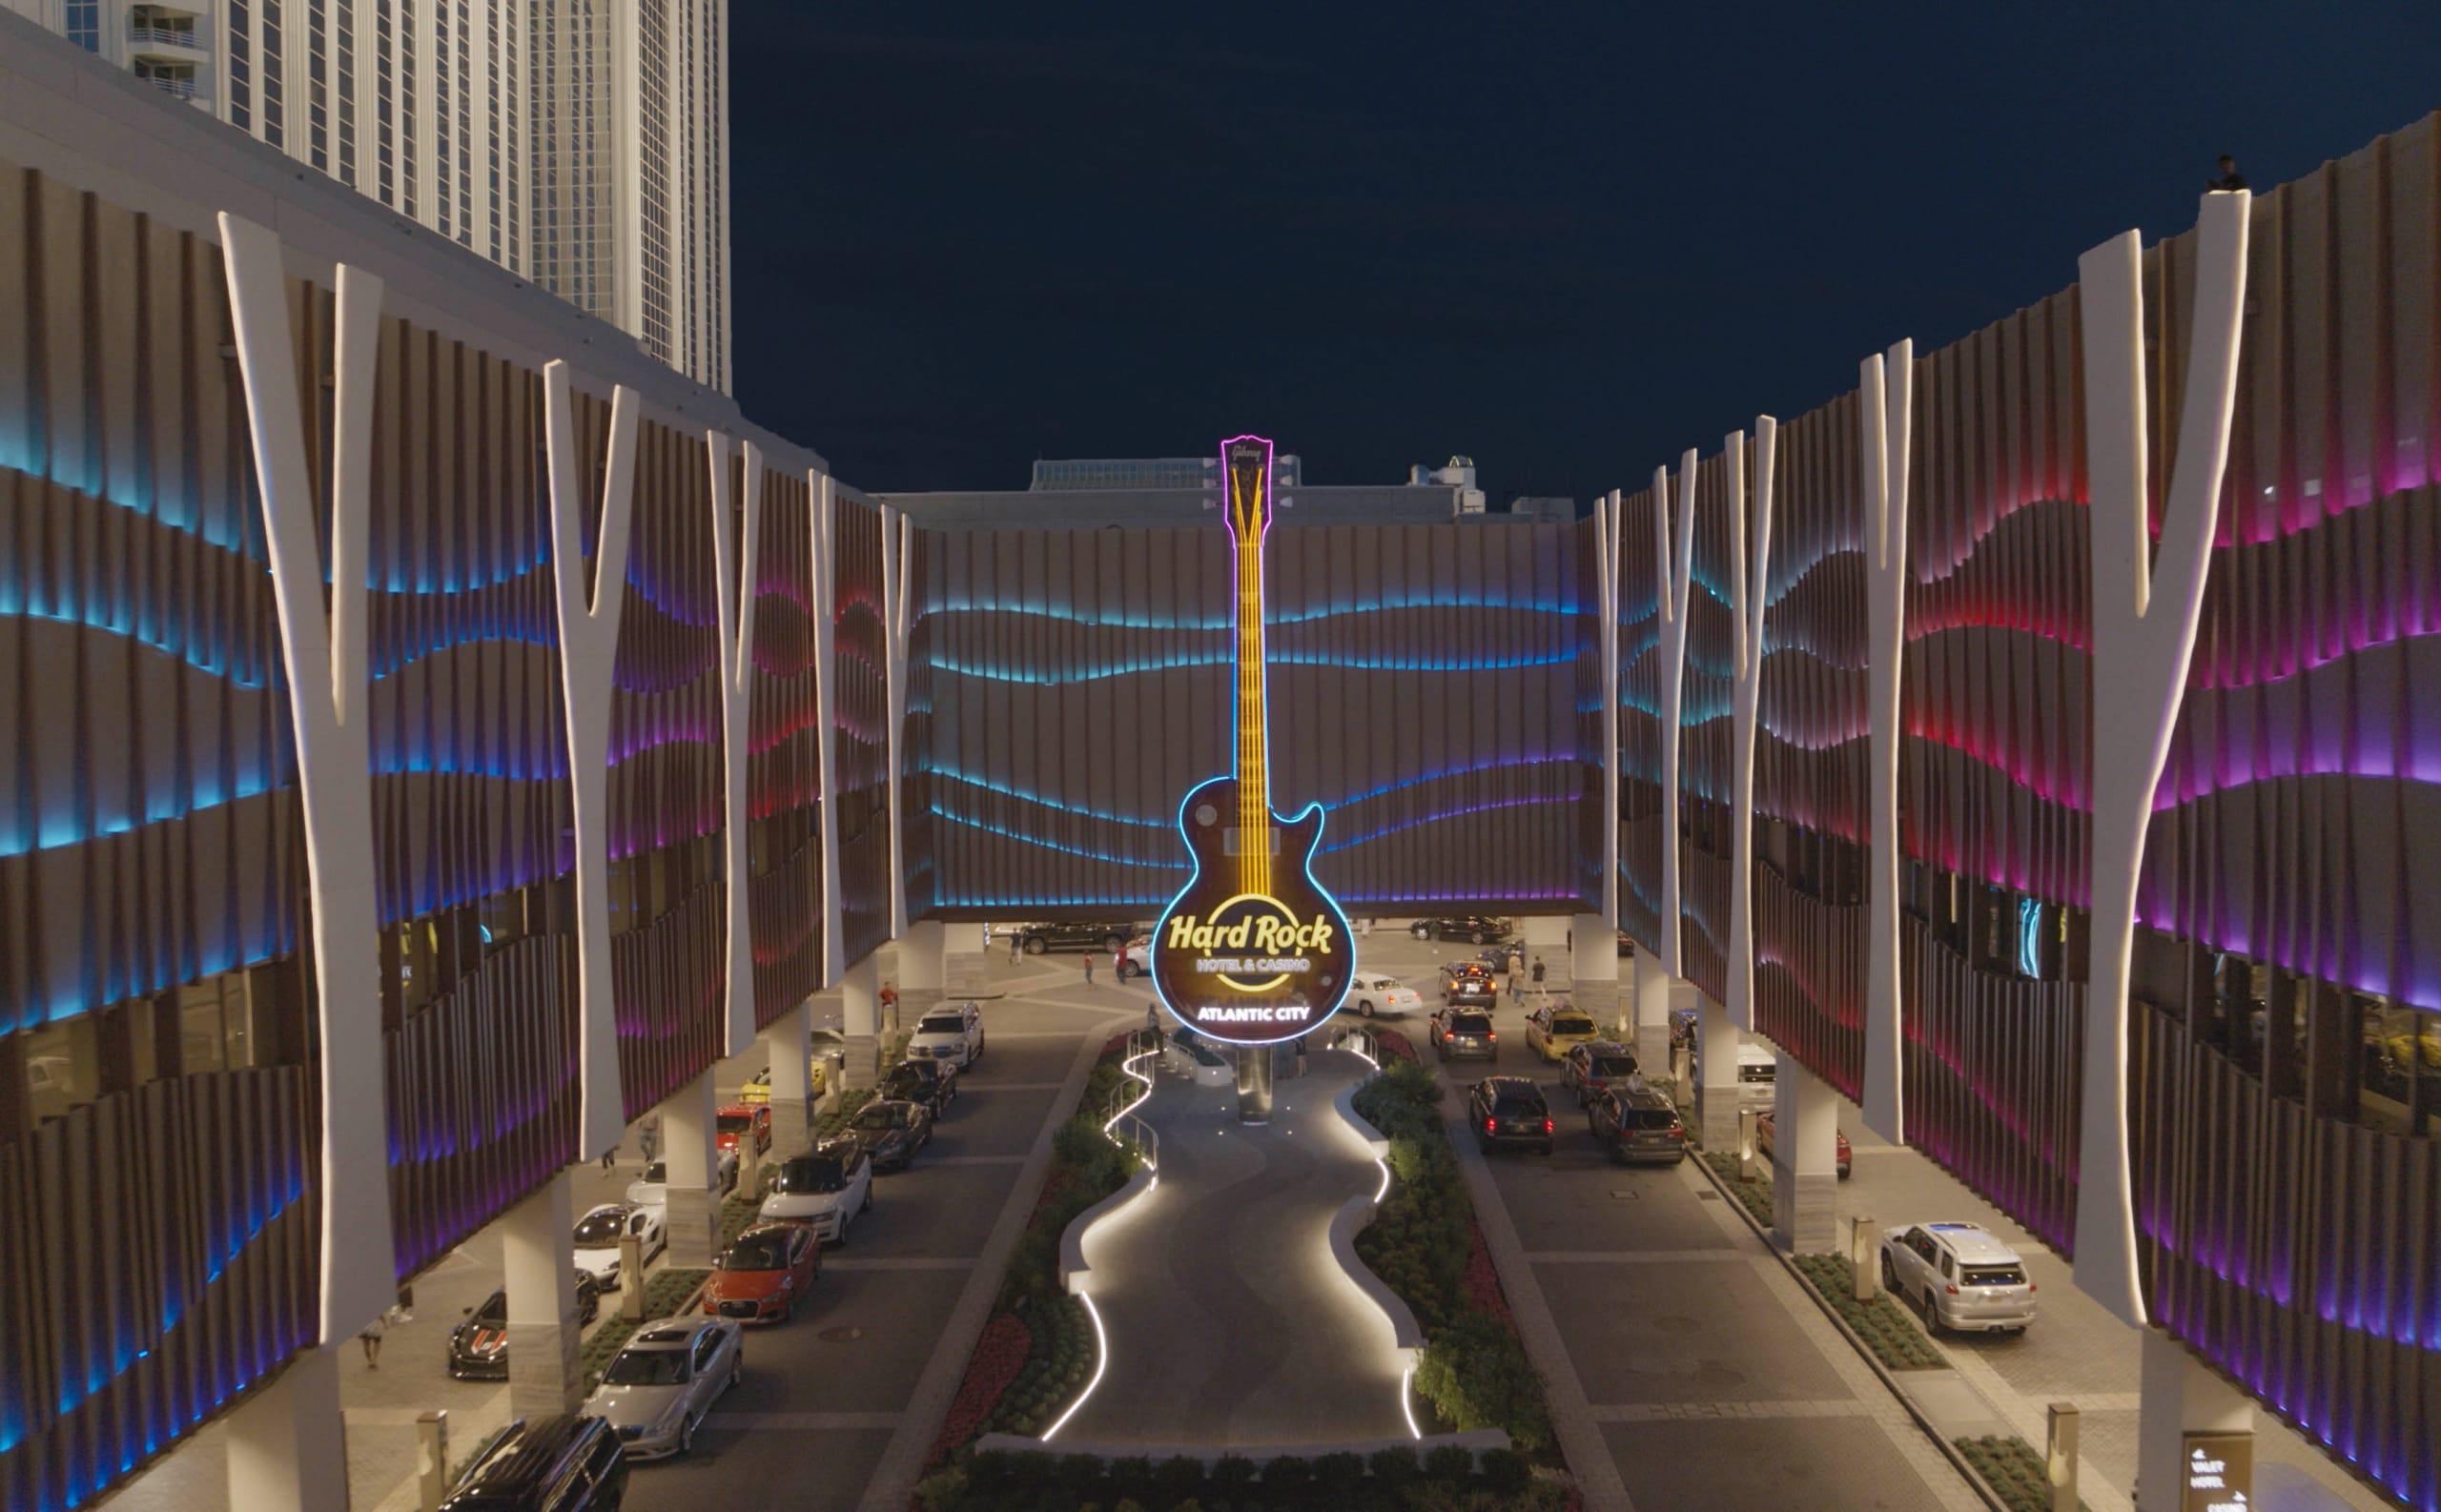 Hard Rock Hotel & Casino